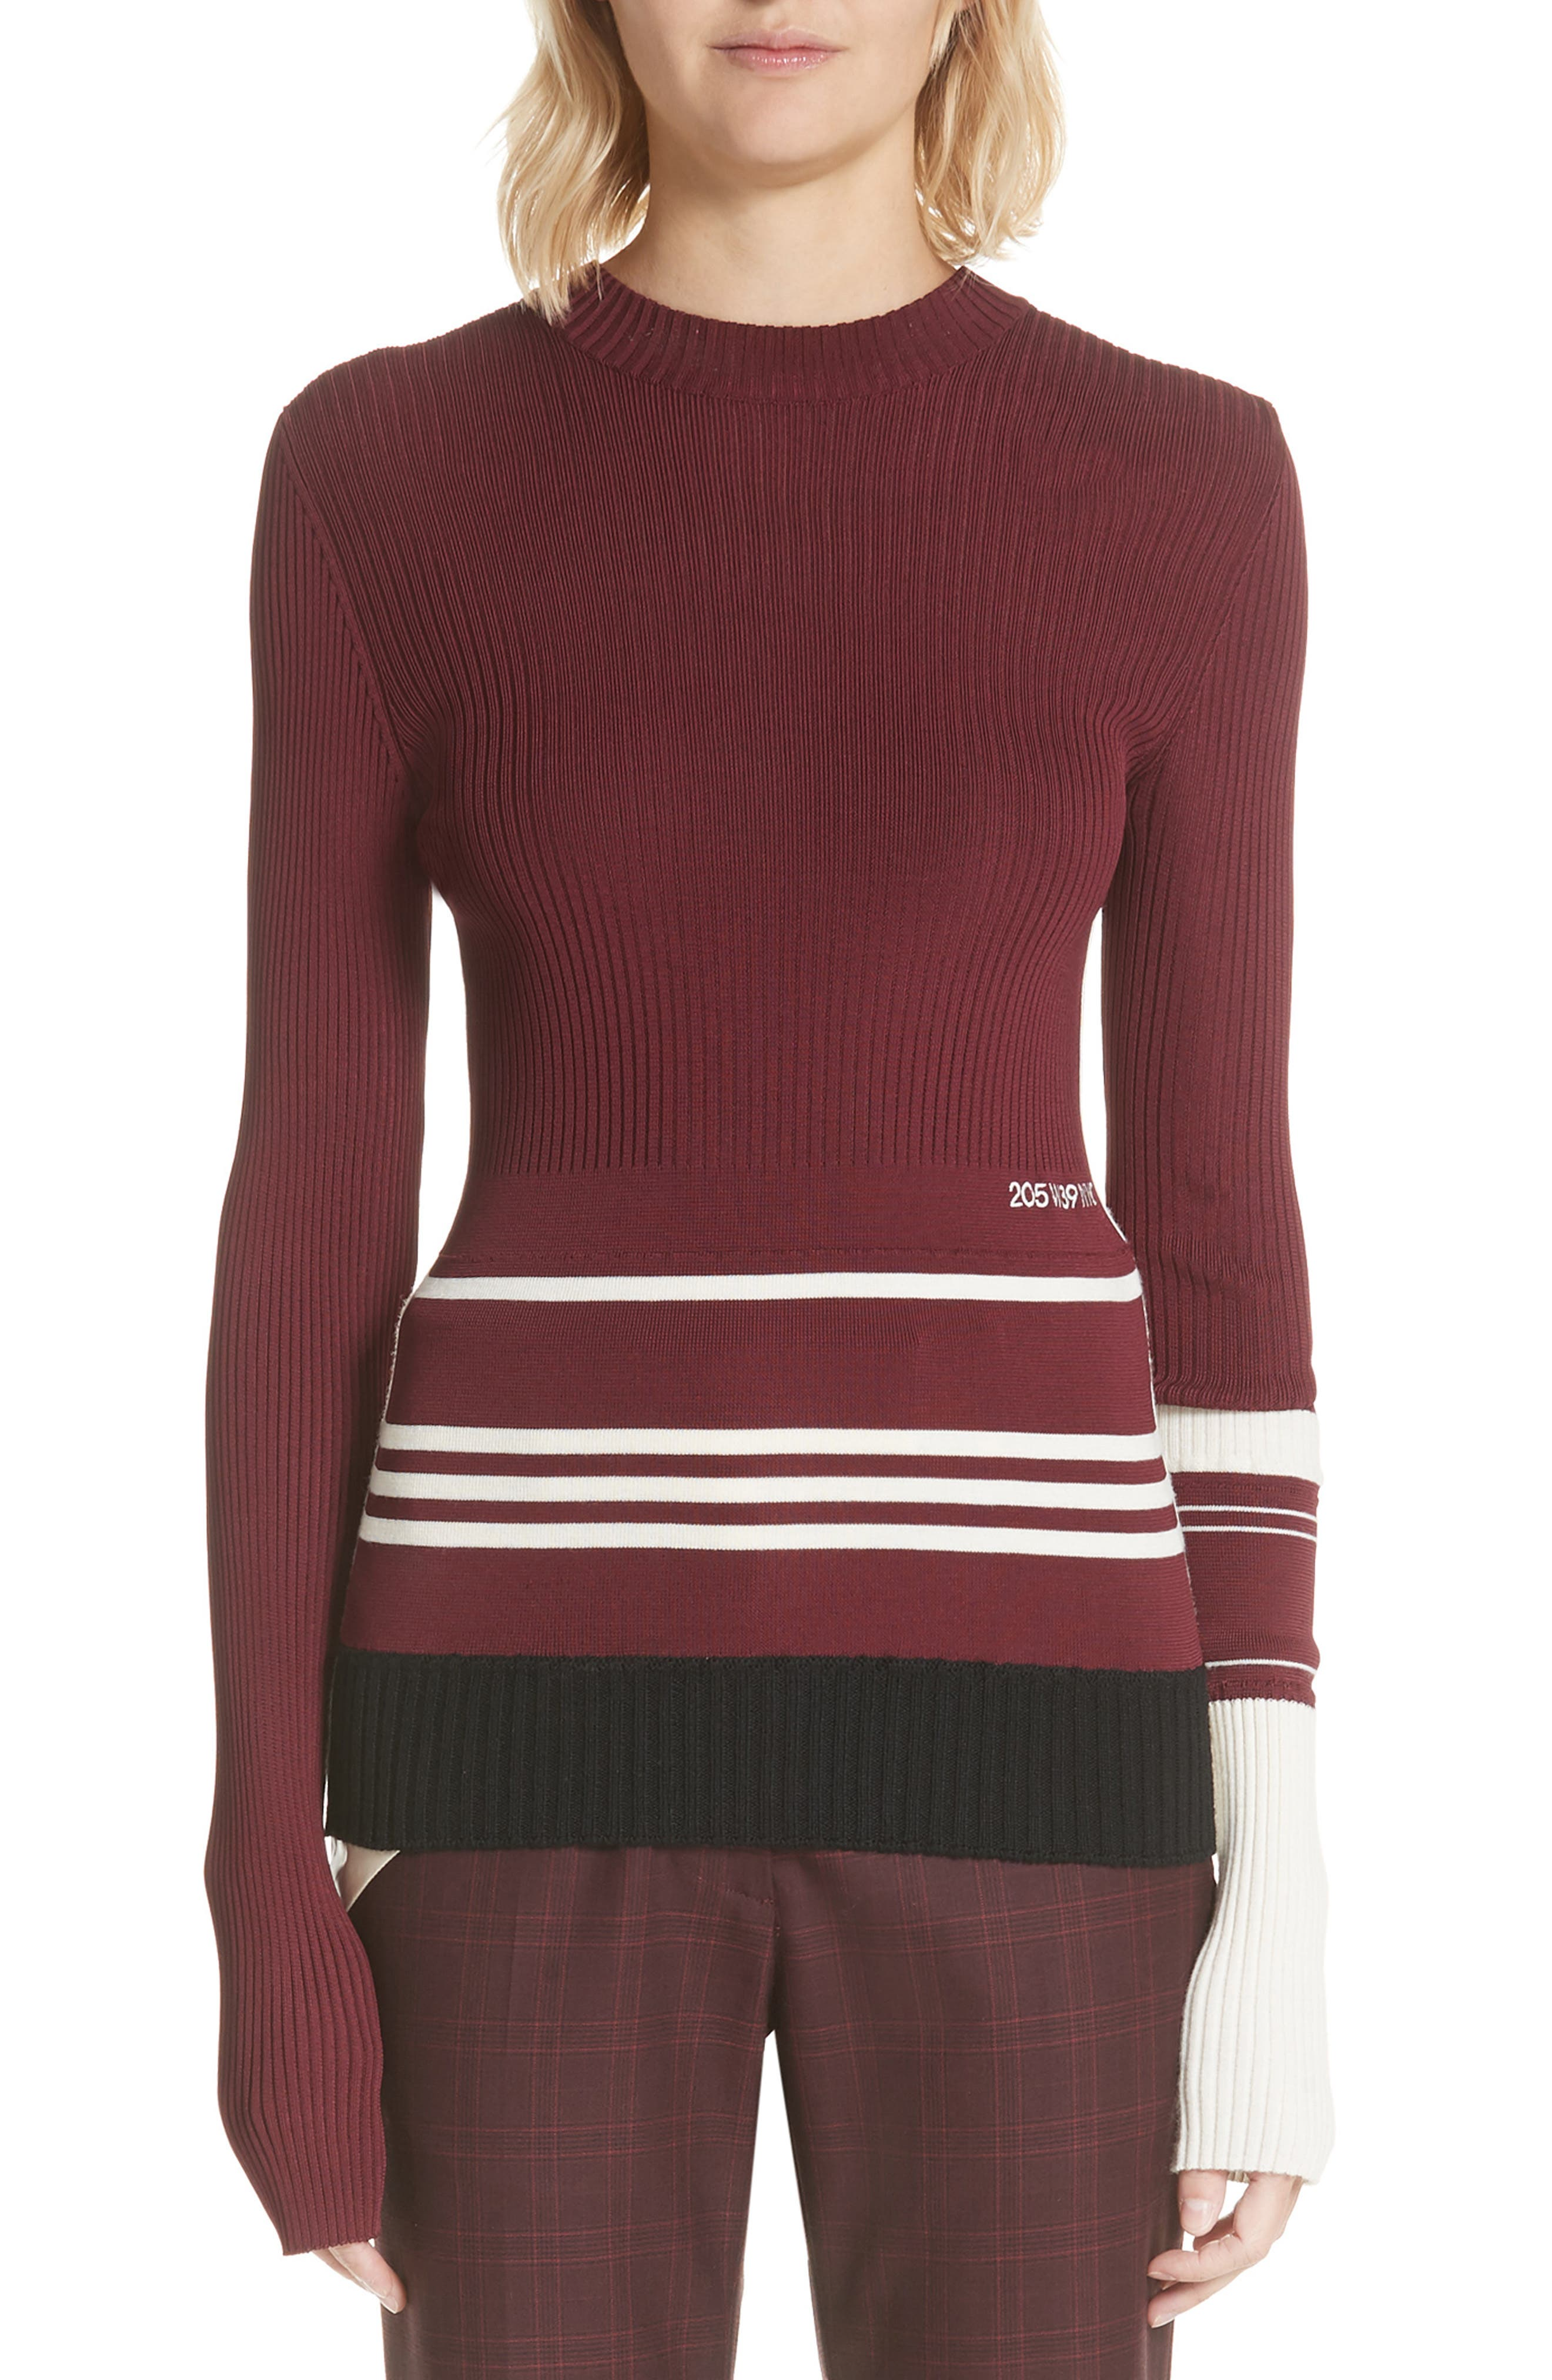 Calvin Klein 205W39Nyc Varsity Stripe Colorblock Sweater, Red